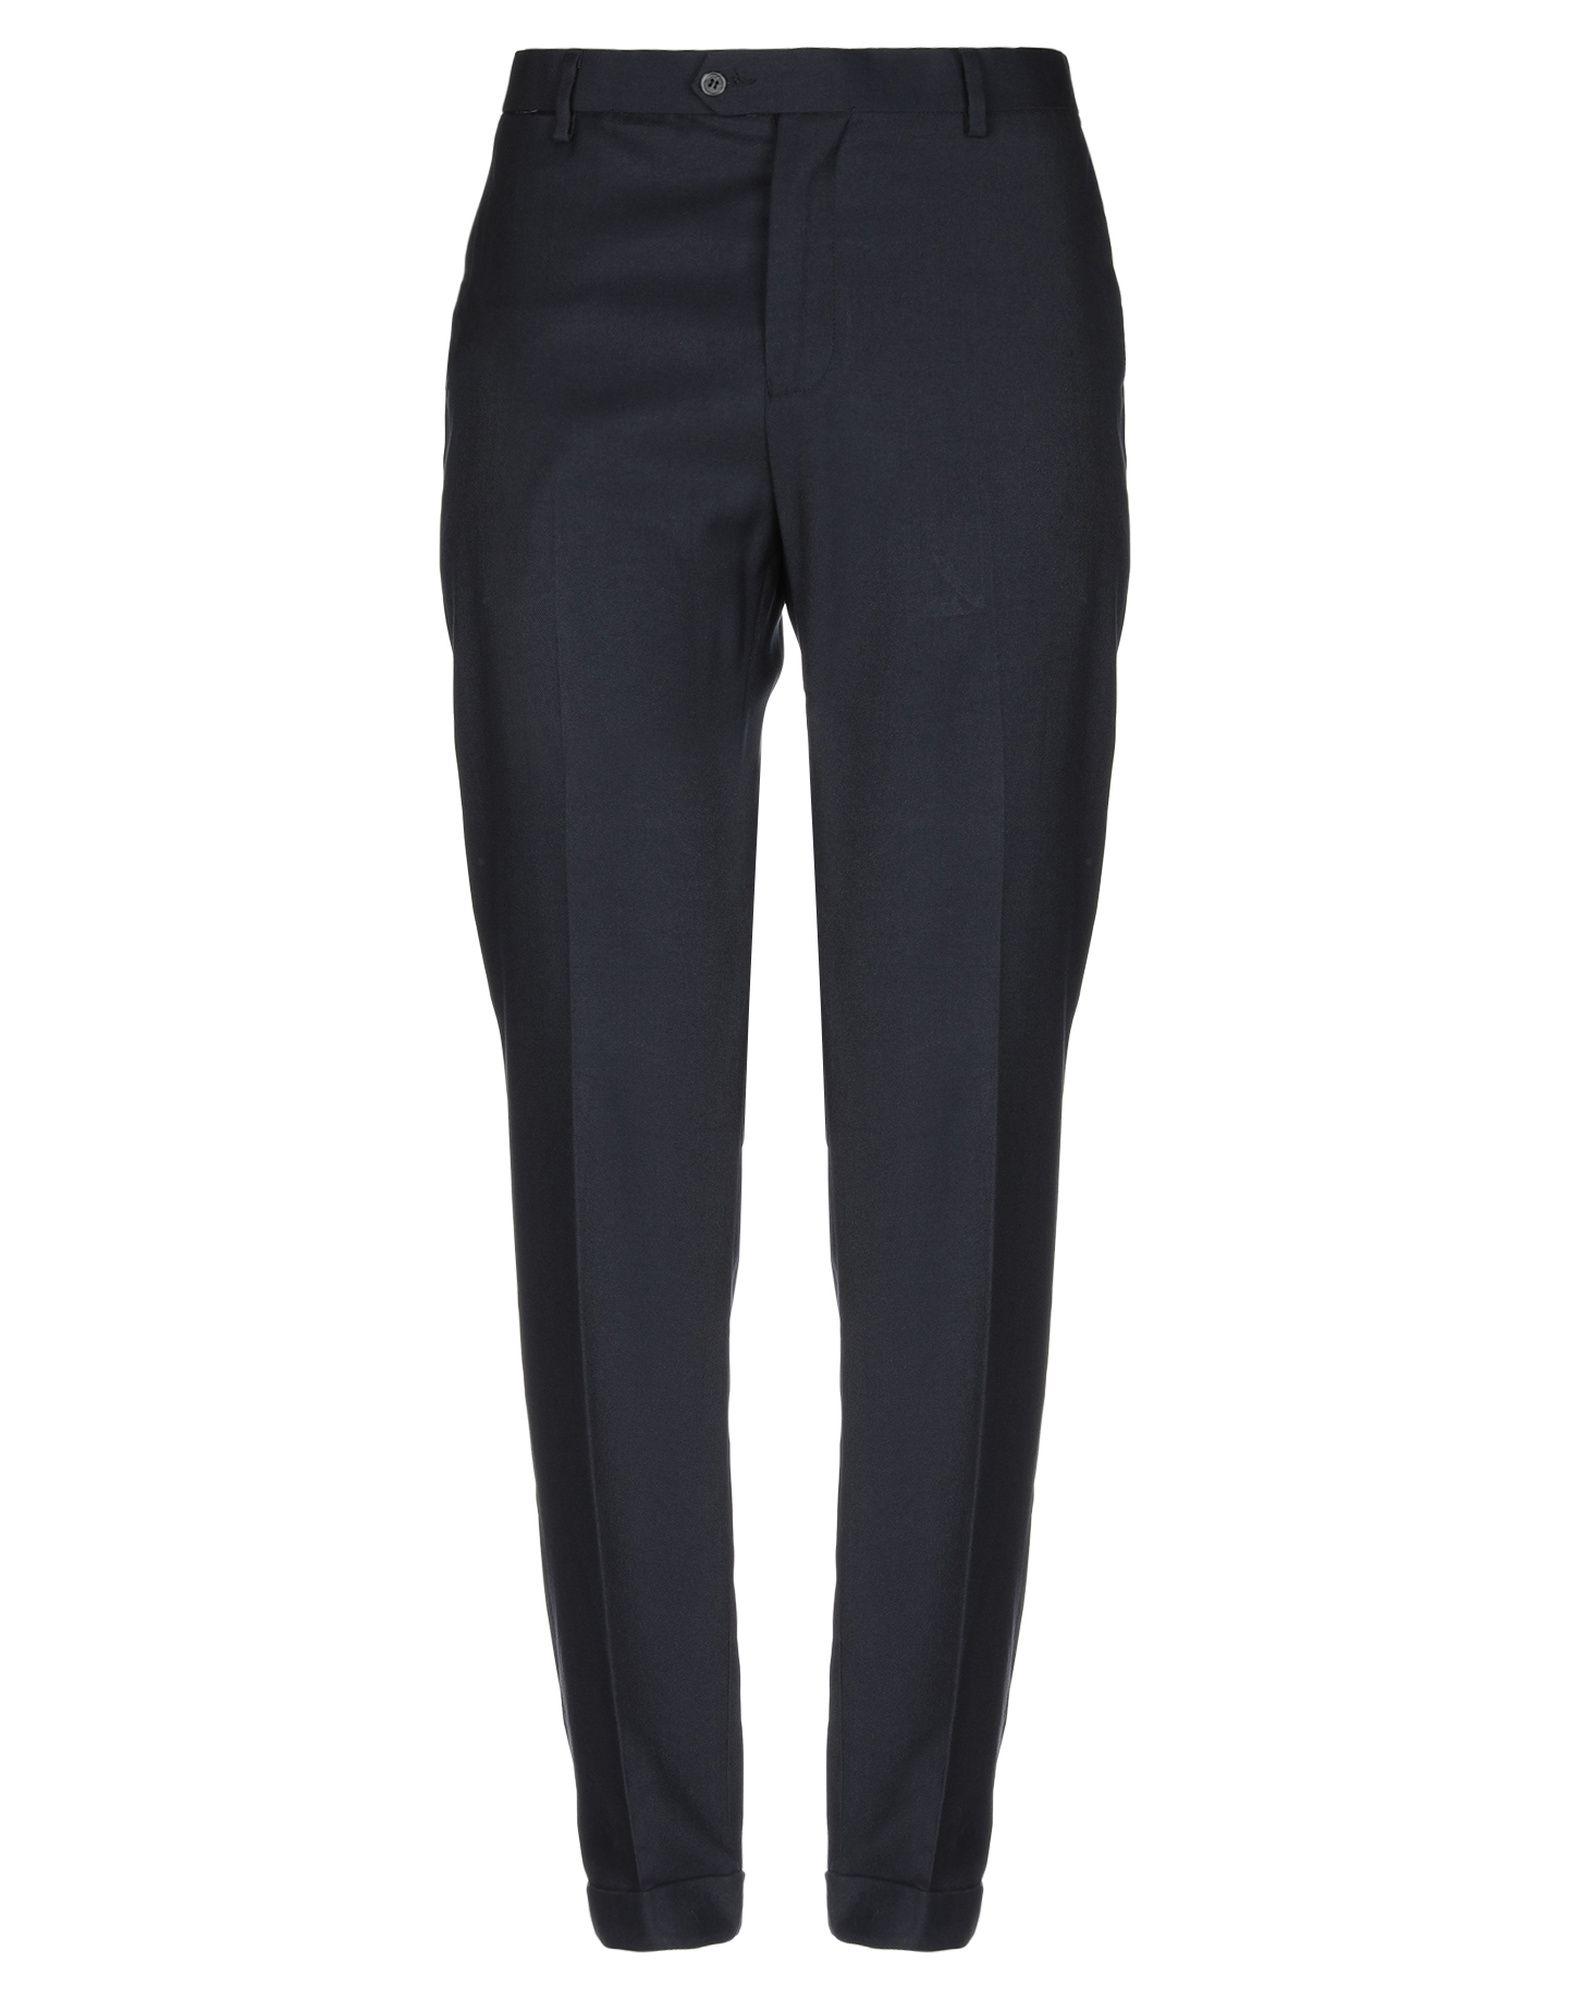 Pantalone Pantalone Guess By Marciano uomo - 13340718KH